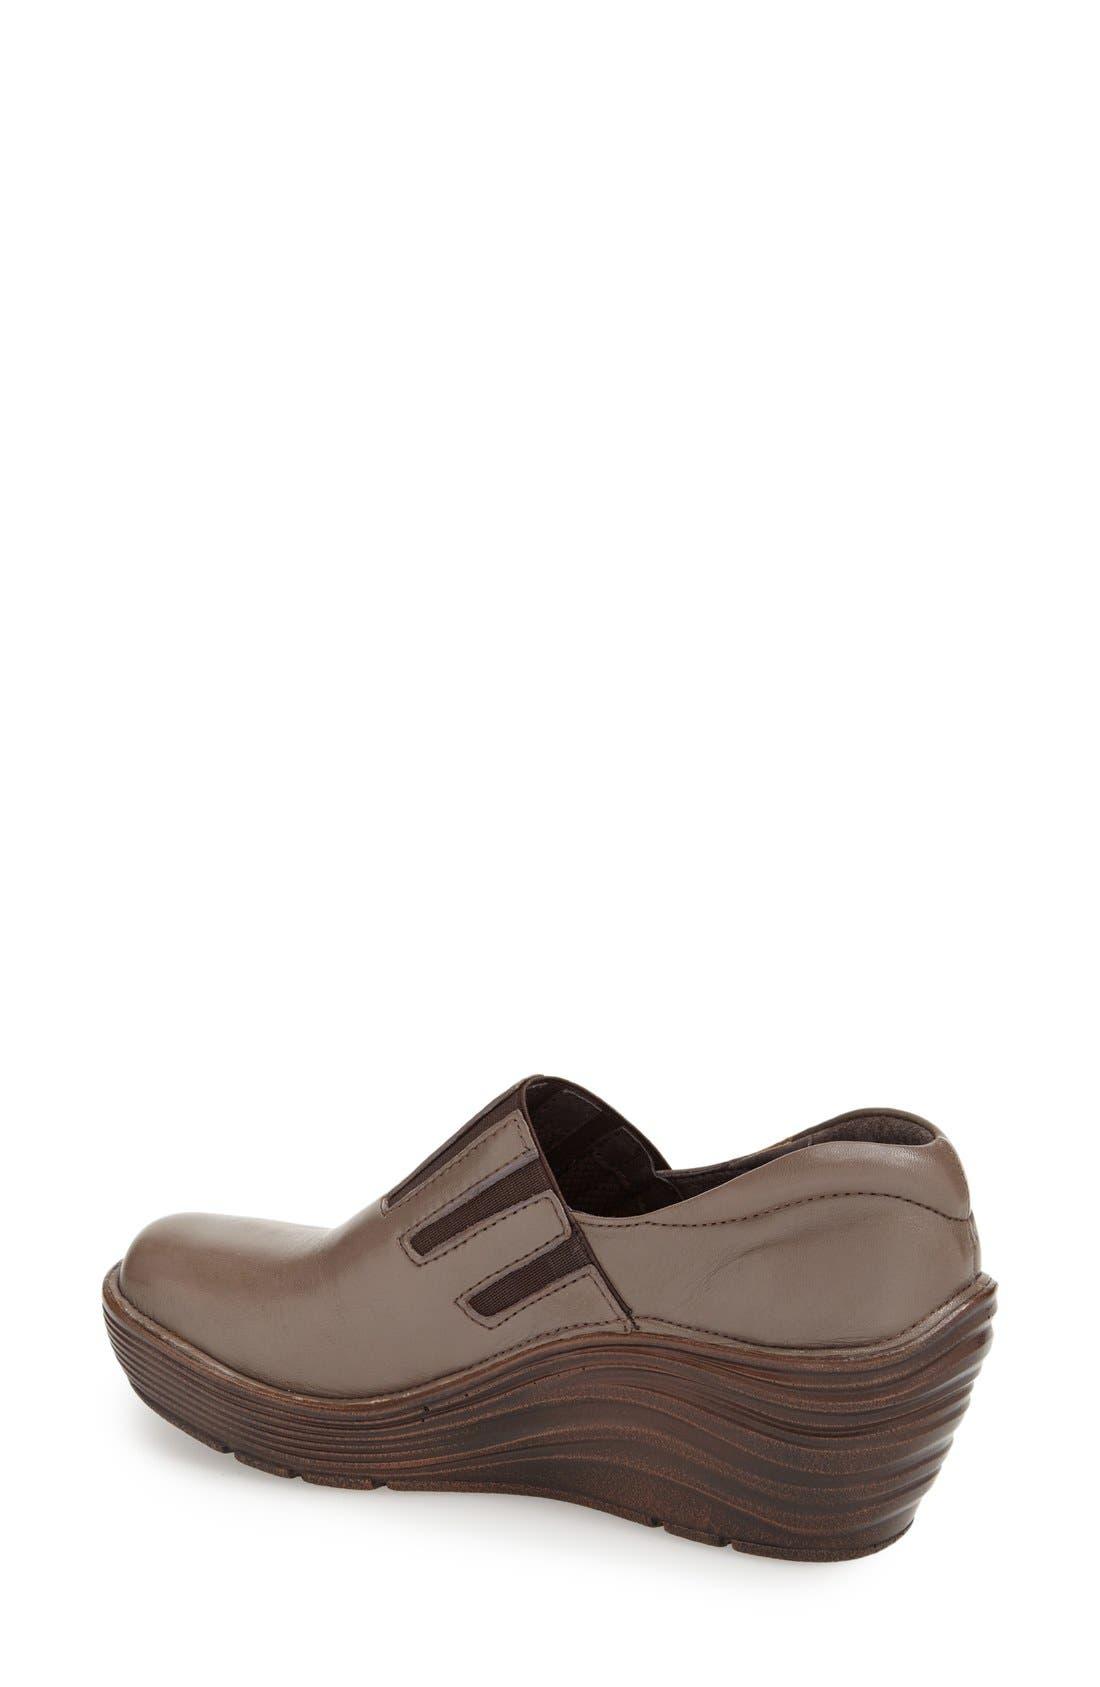 'Coast' Clog,                             Alternate thumbnail 2, color,                             Taupe Grey Leather